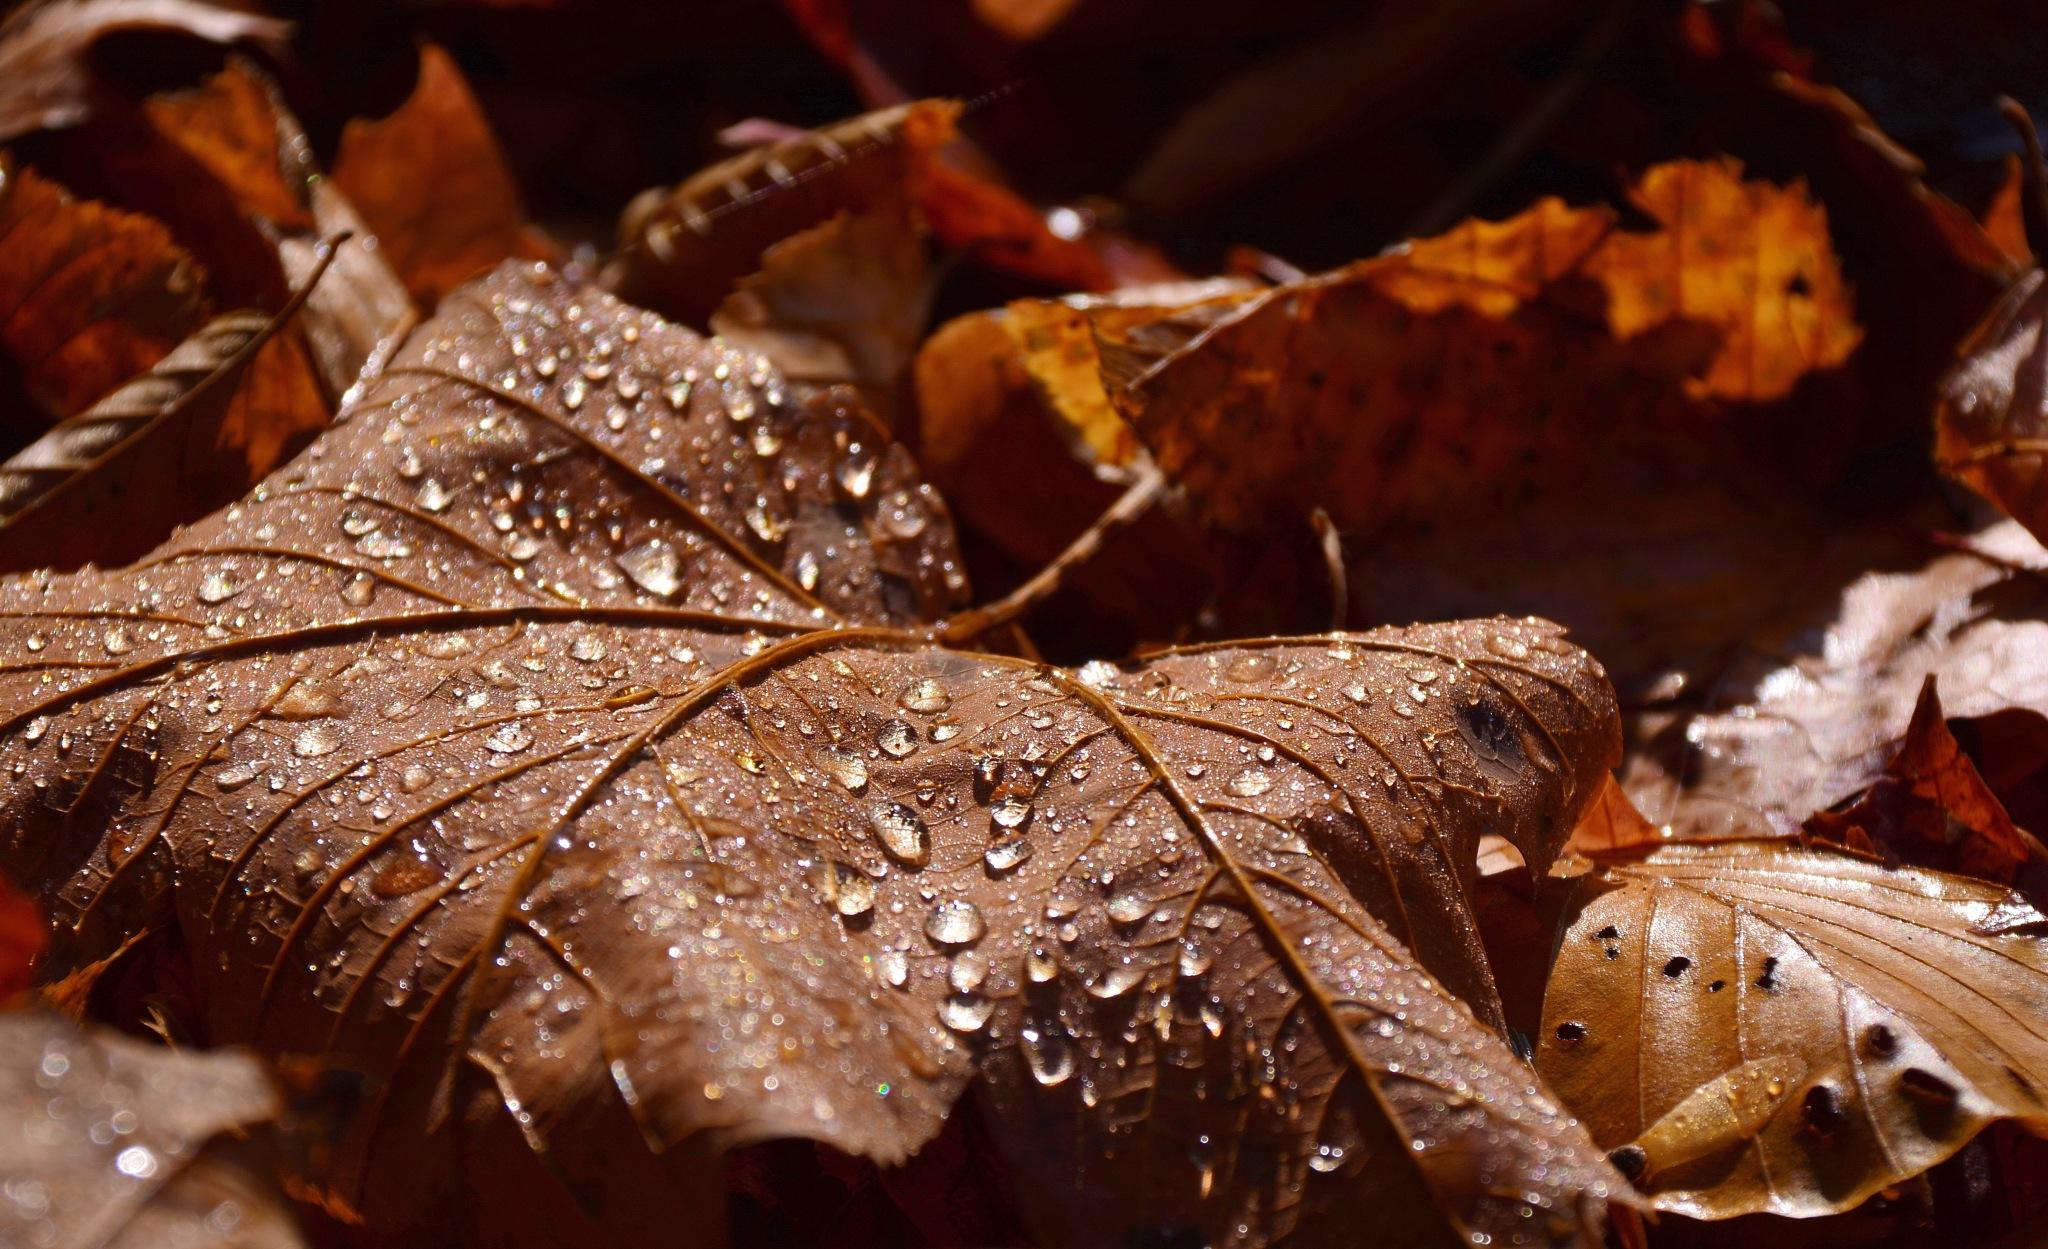 Autumn drops by maradesign